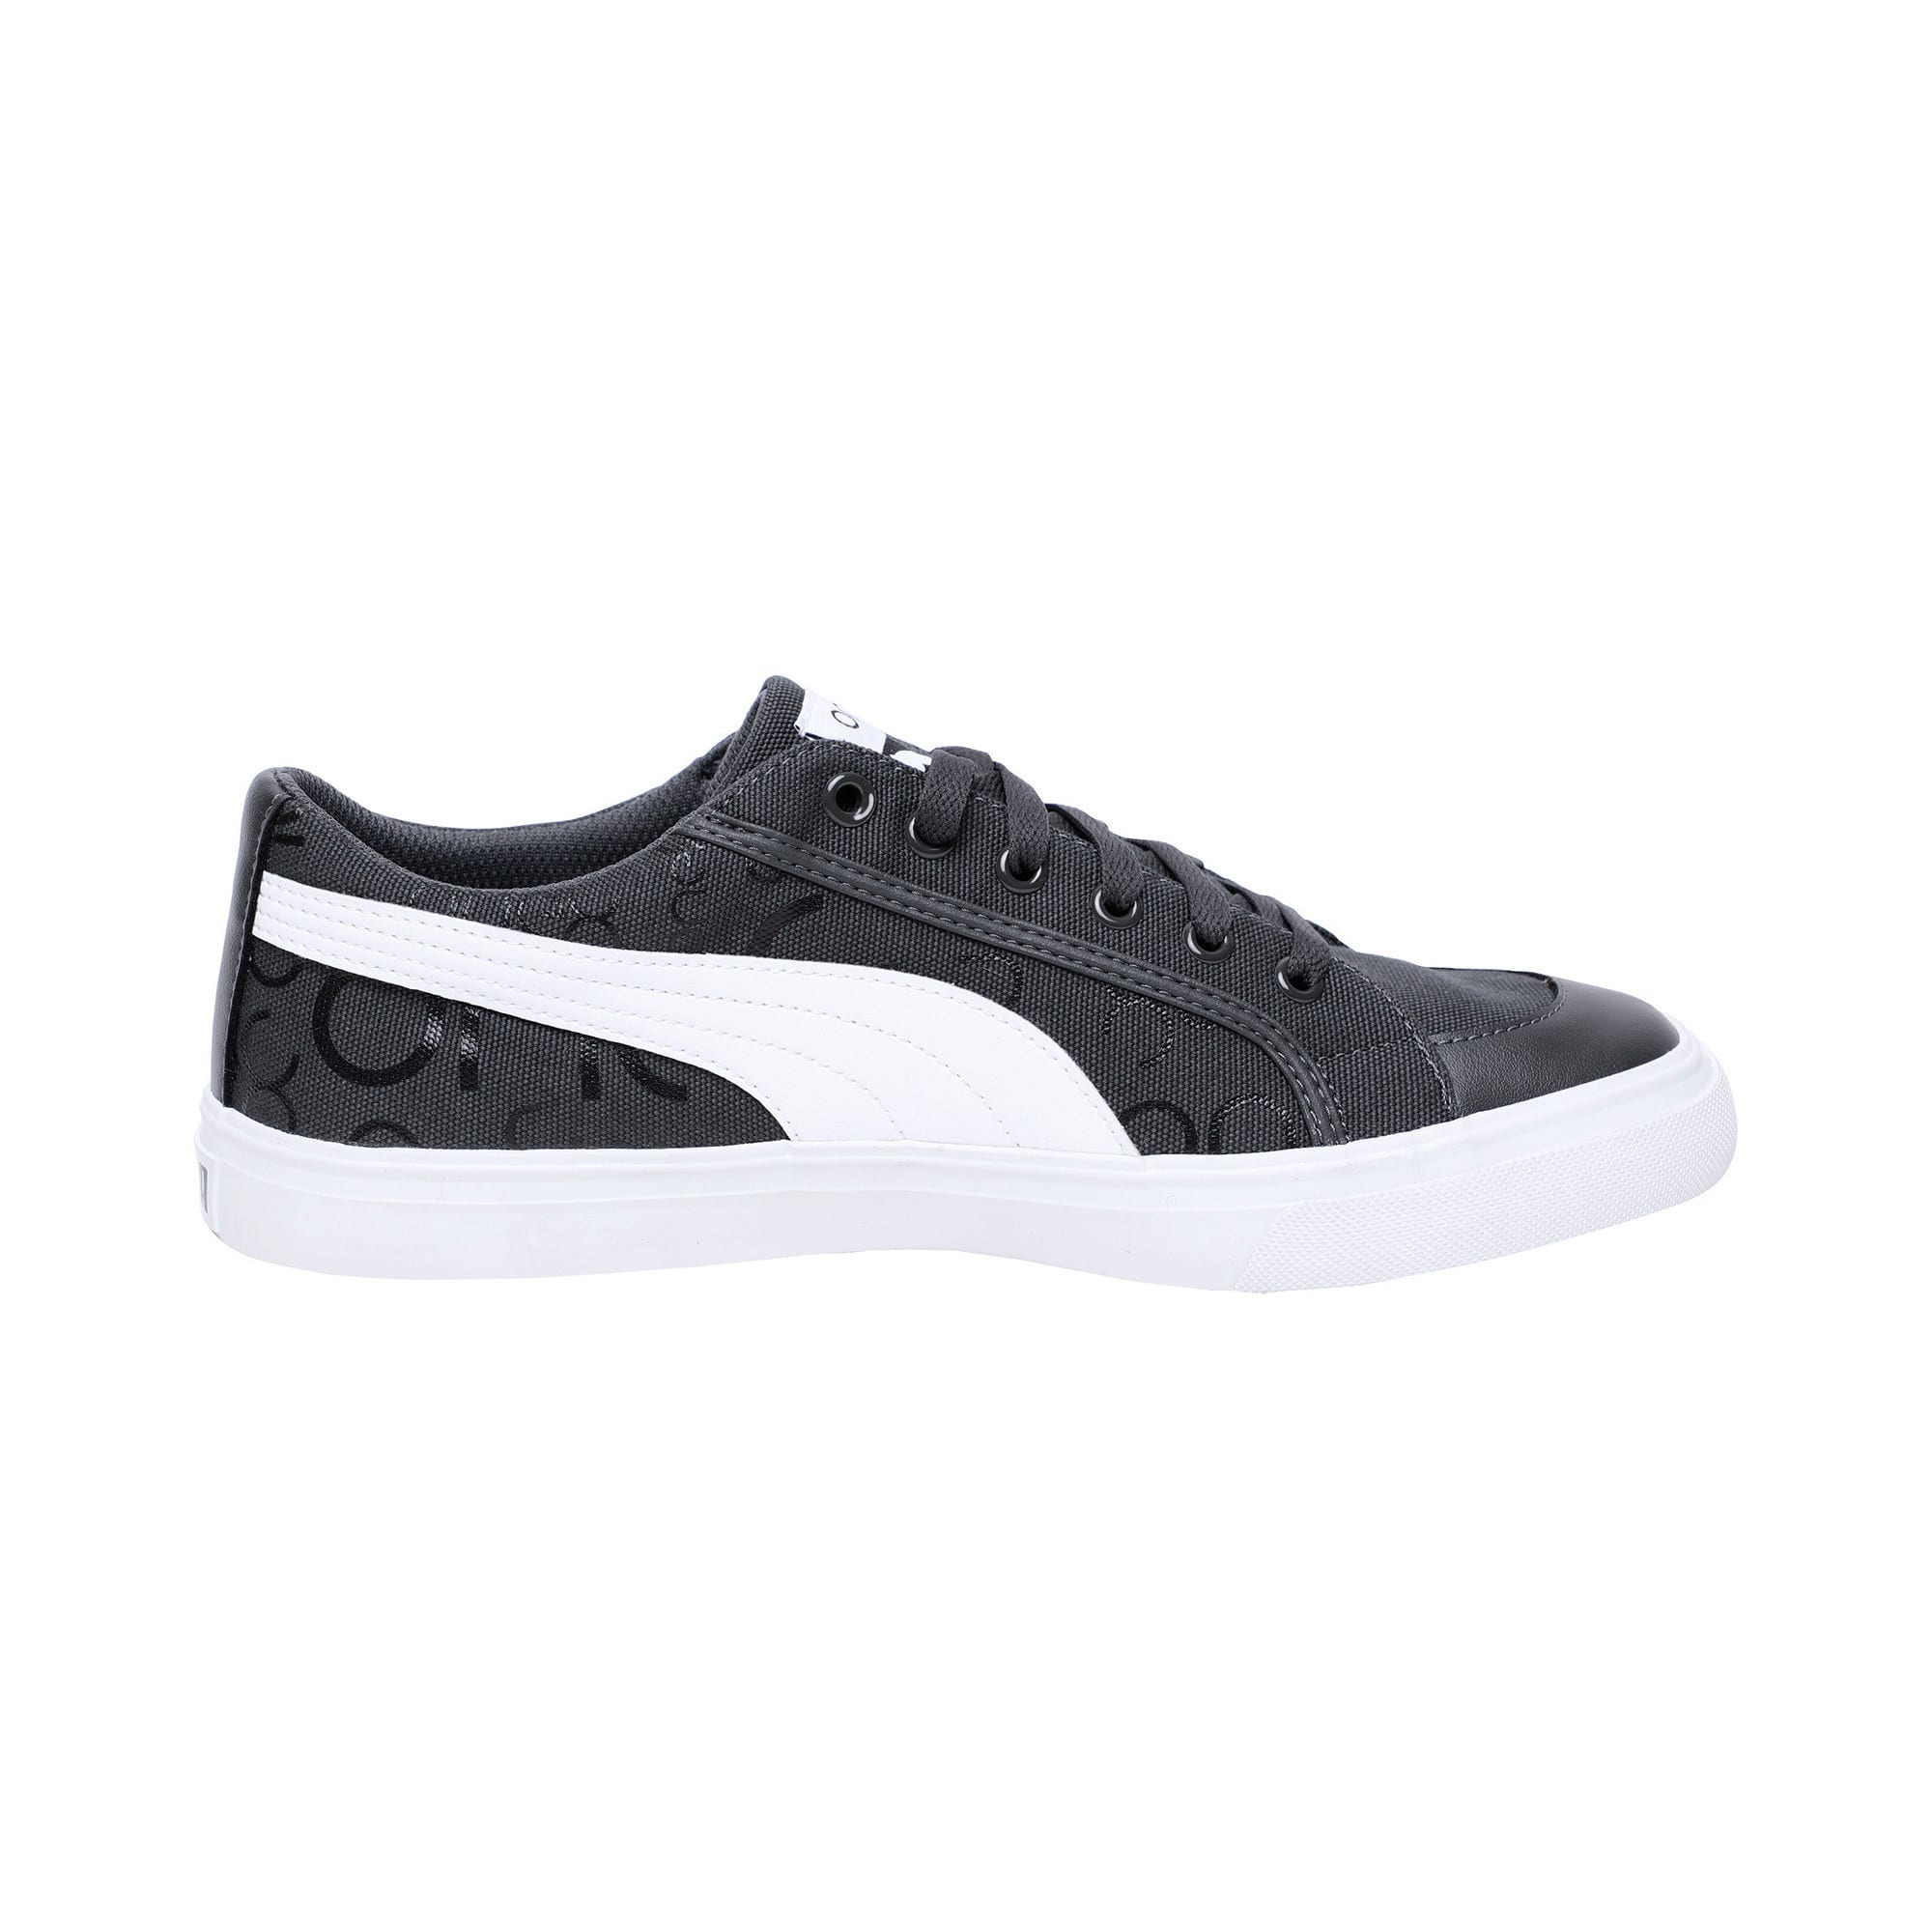 Thumbnail 4 of one8 Men's Sneakers, Iron Gate-Puma White-Black, medium-IND